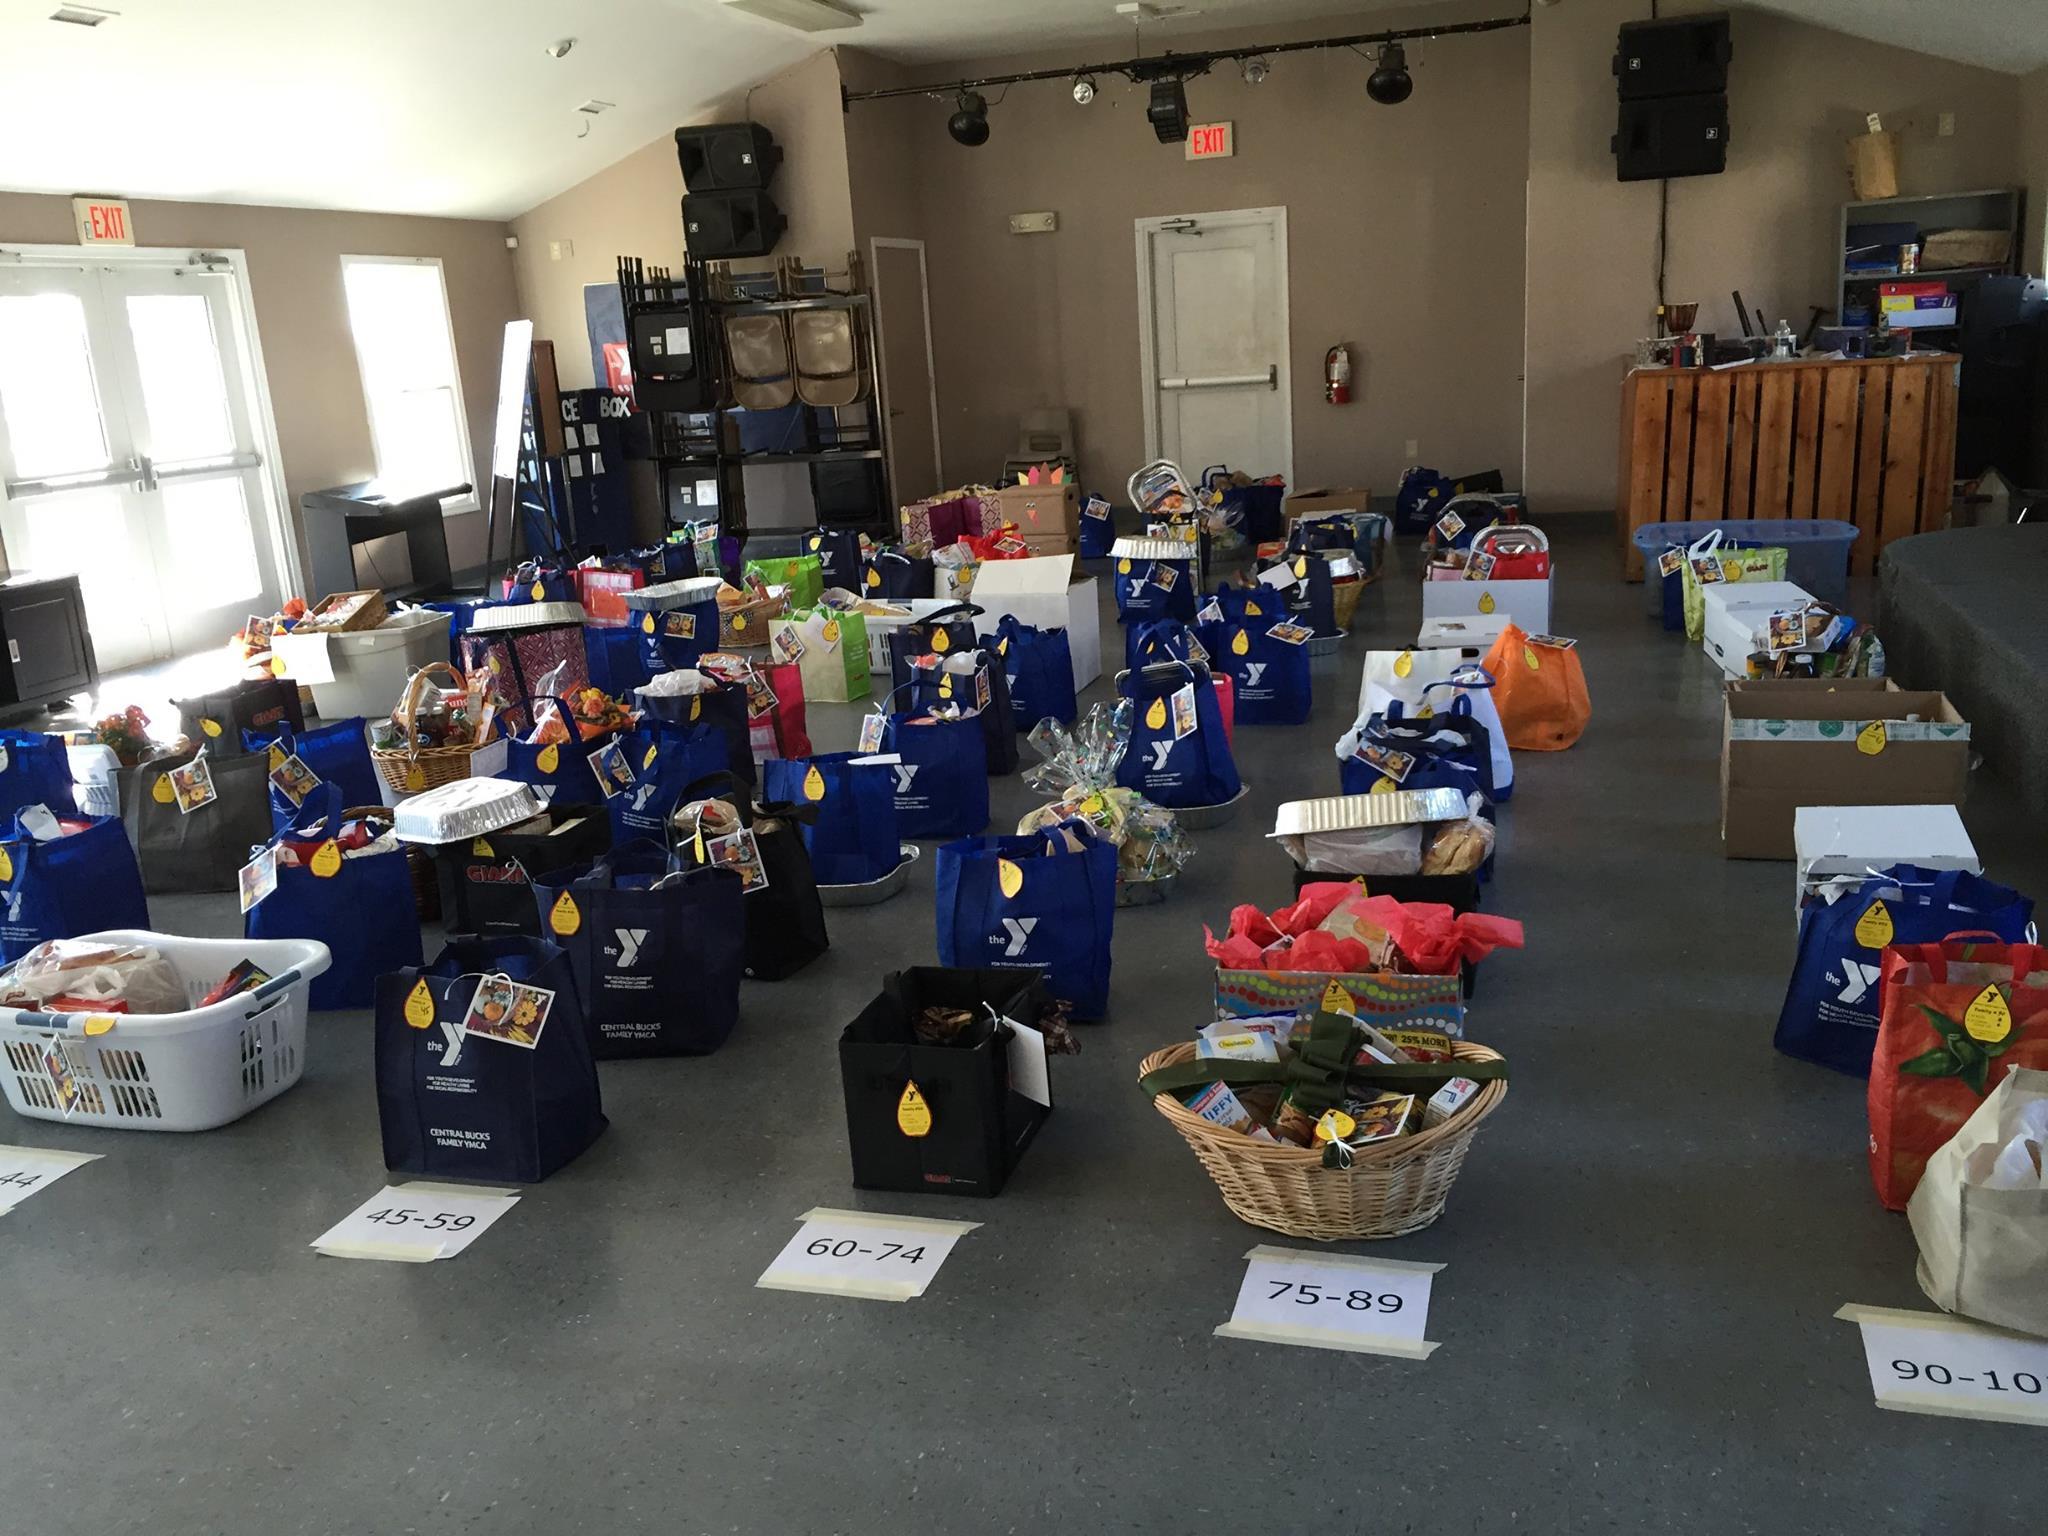 4th Quarter 2014 Volunteer Doylestown, PA